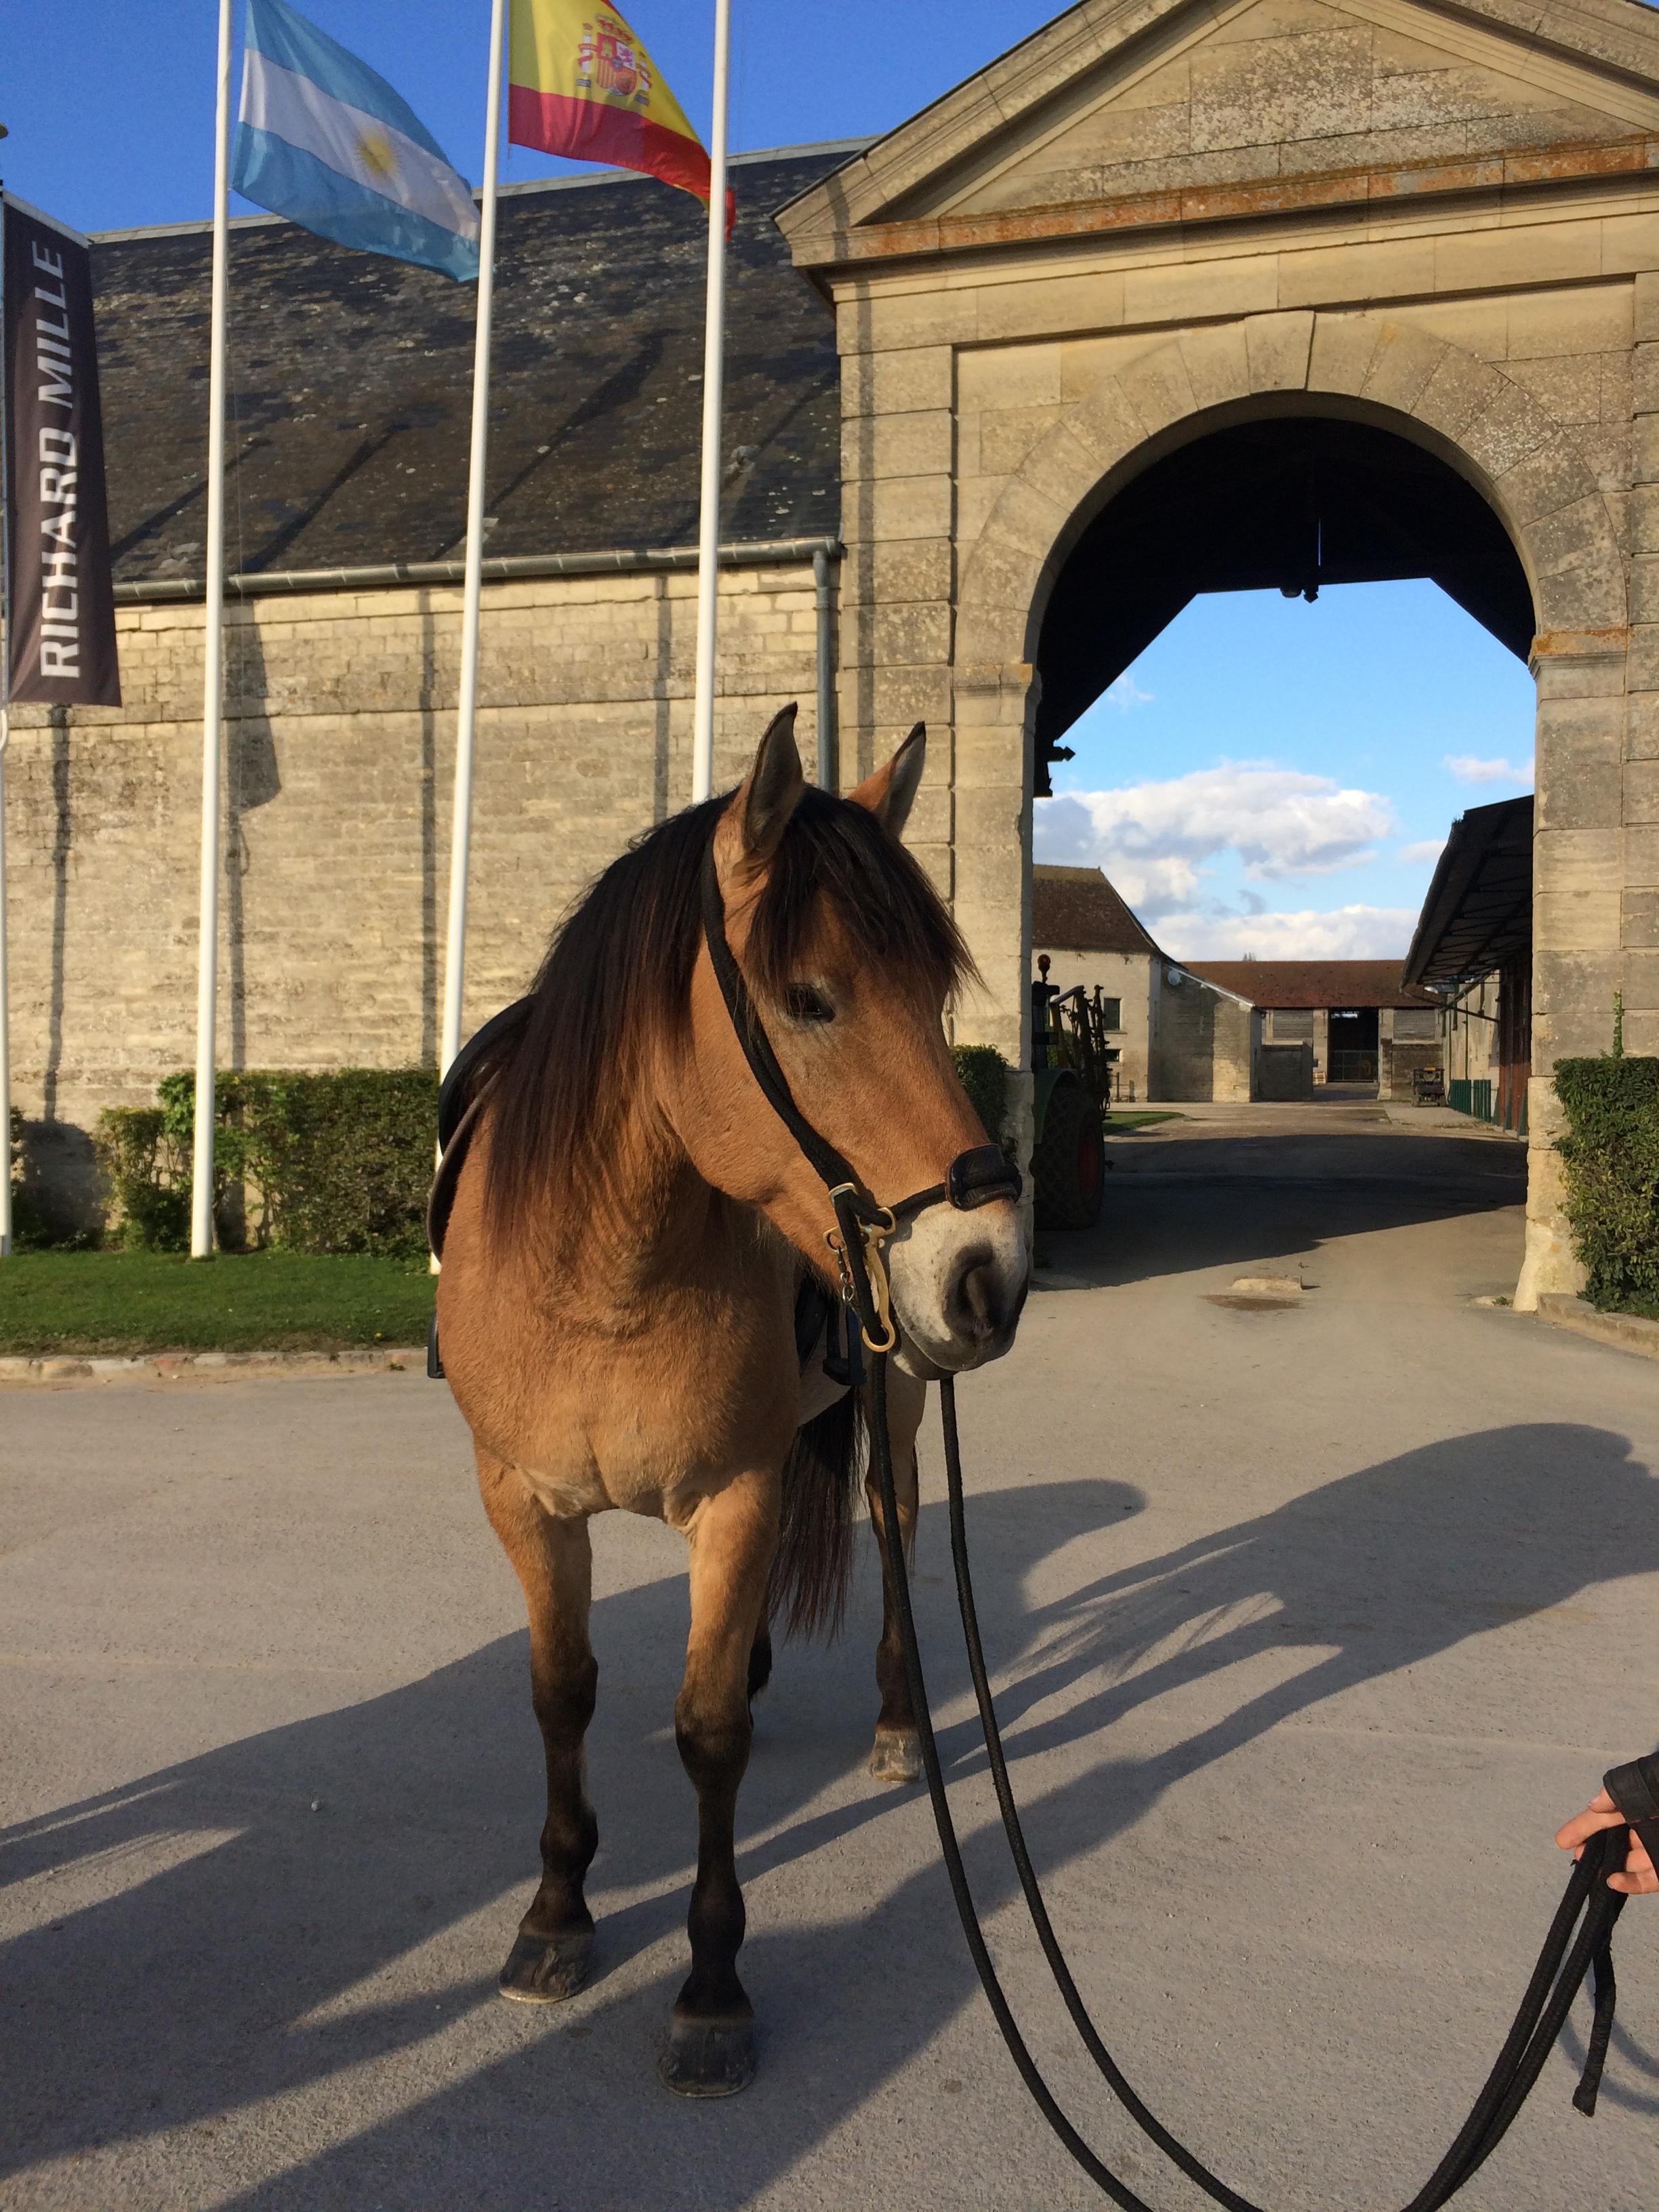 race-equipe-henson-poney-cheval-robe-isabelle-louvet-chantilly-polo-randonée-équestre-elevage-baie-de-somme